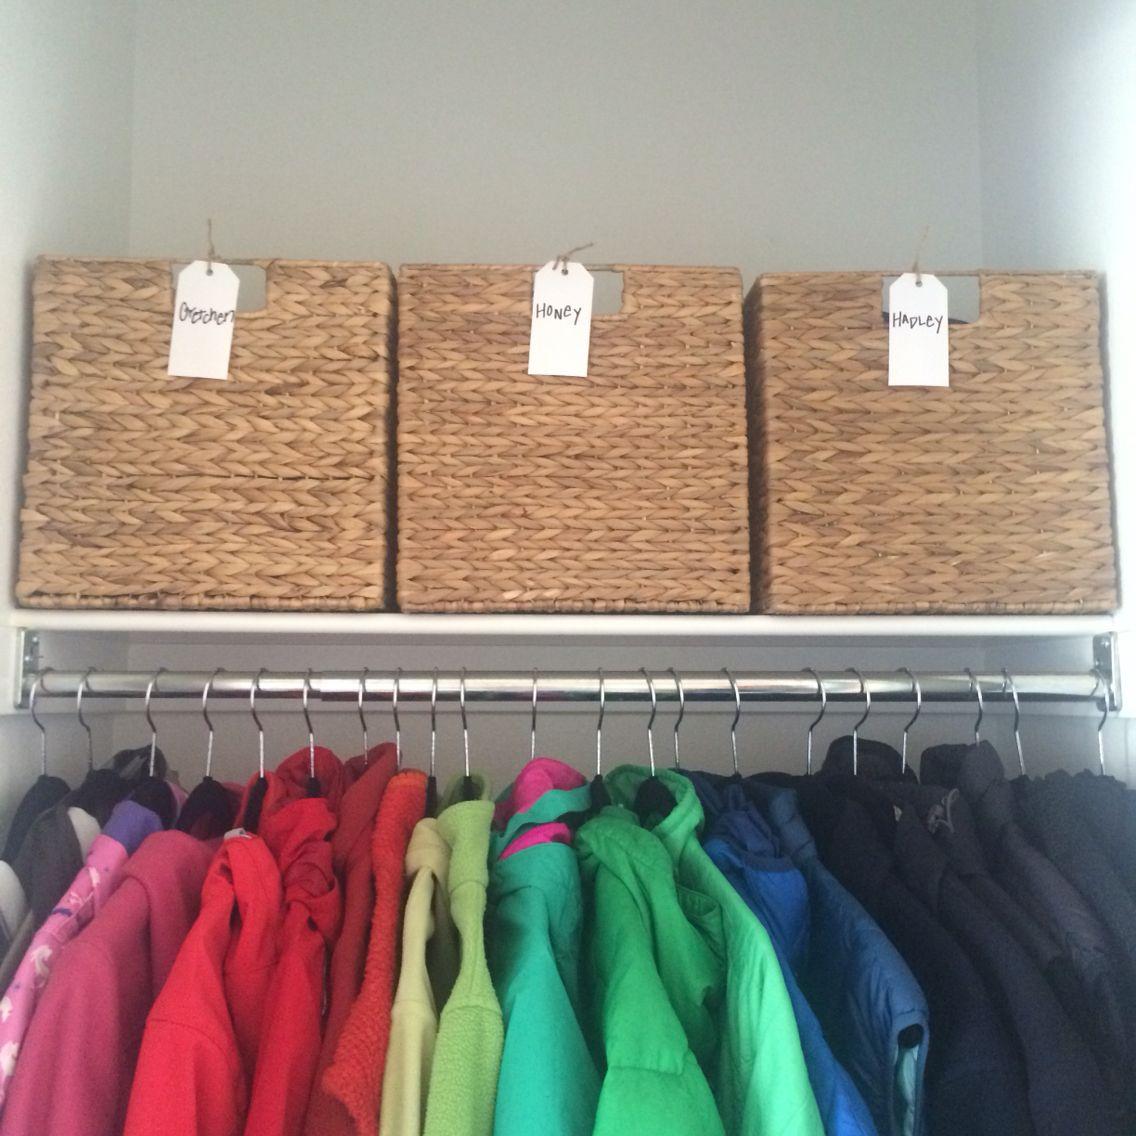 Coat Closet Organization, Hall Closet Organization, NEAT Method Denver, A NEAT Denver Hall Closet